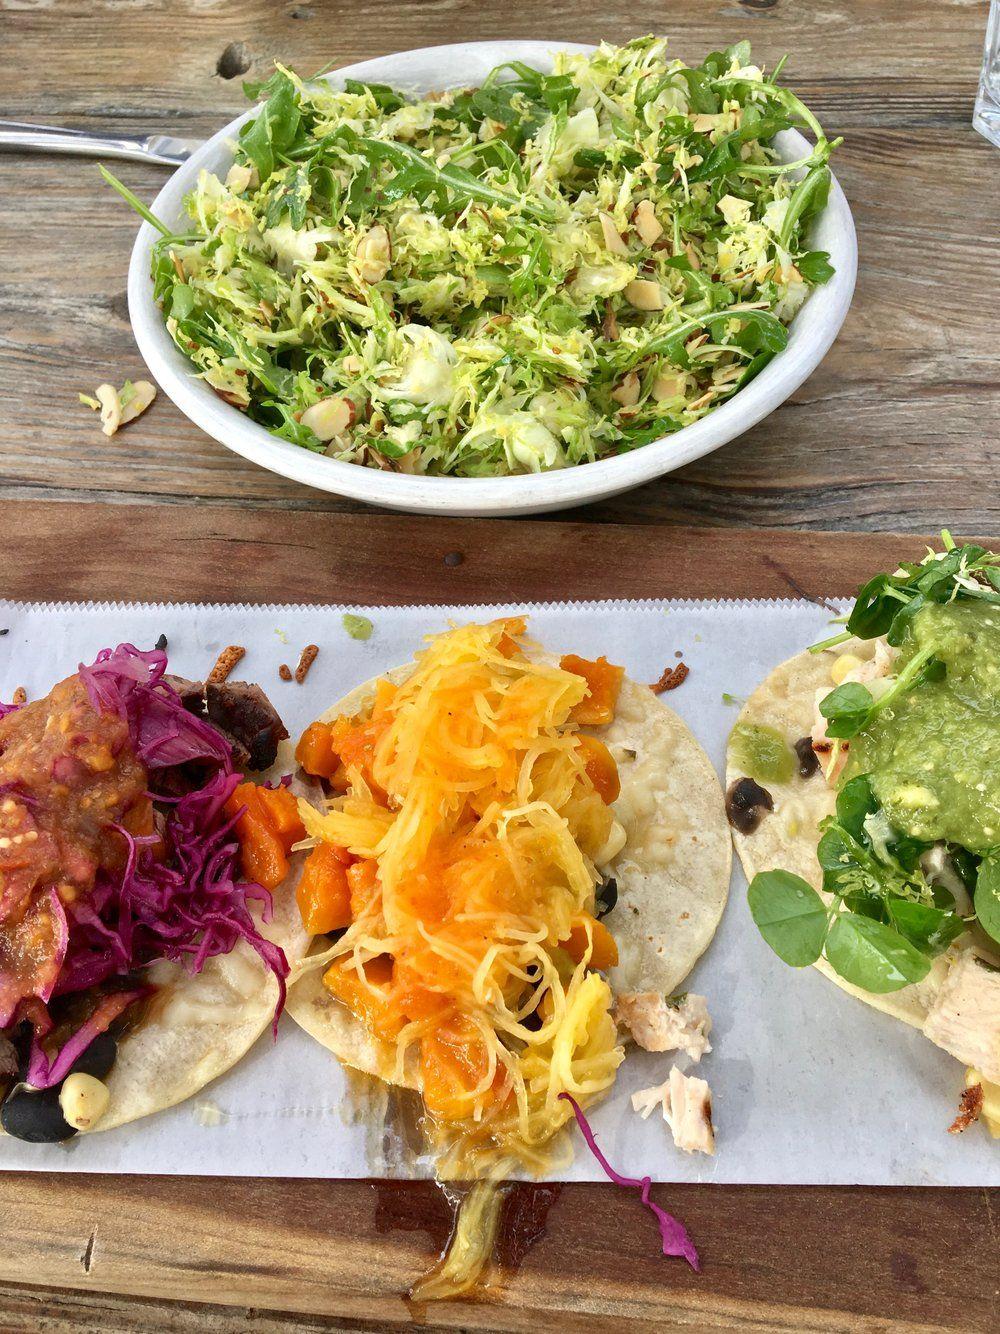 Malibu salad with smoked chicken: a recipe with photos 24